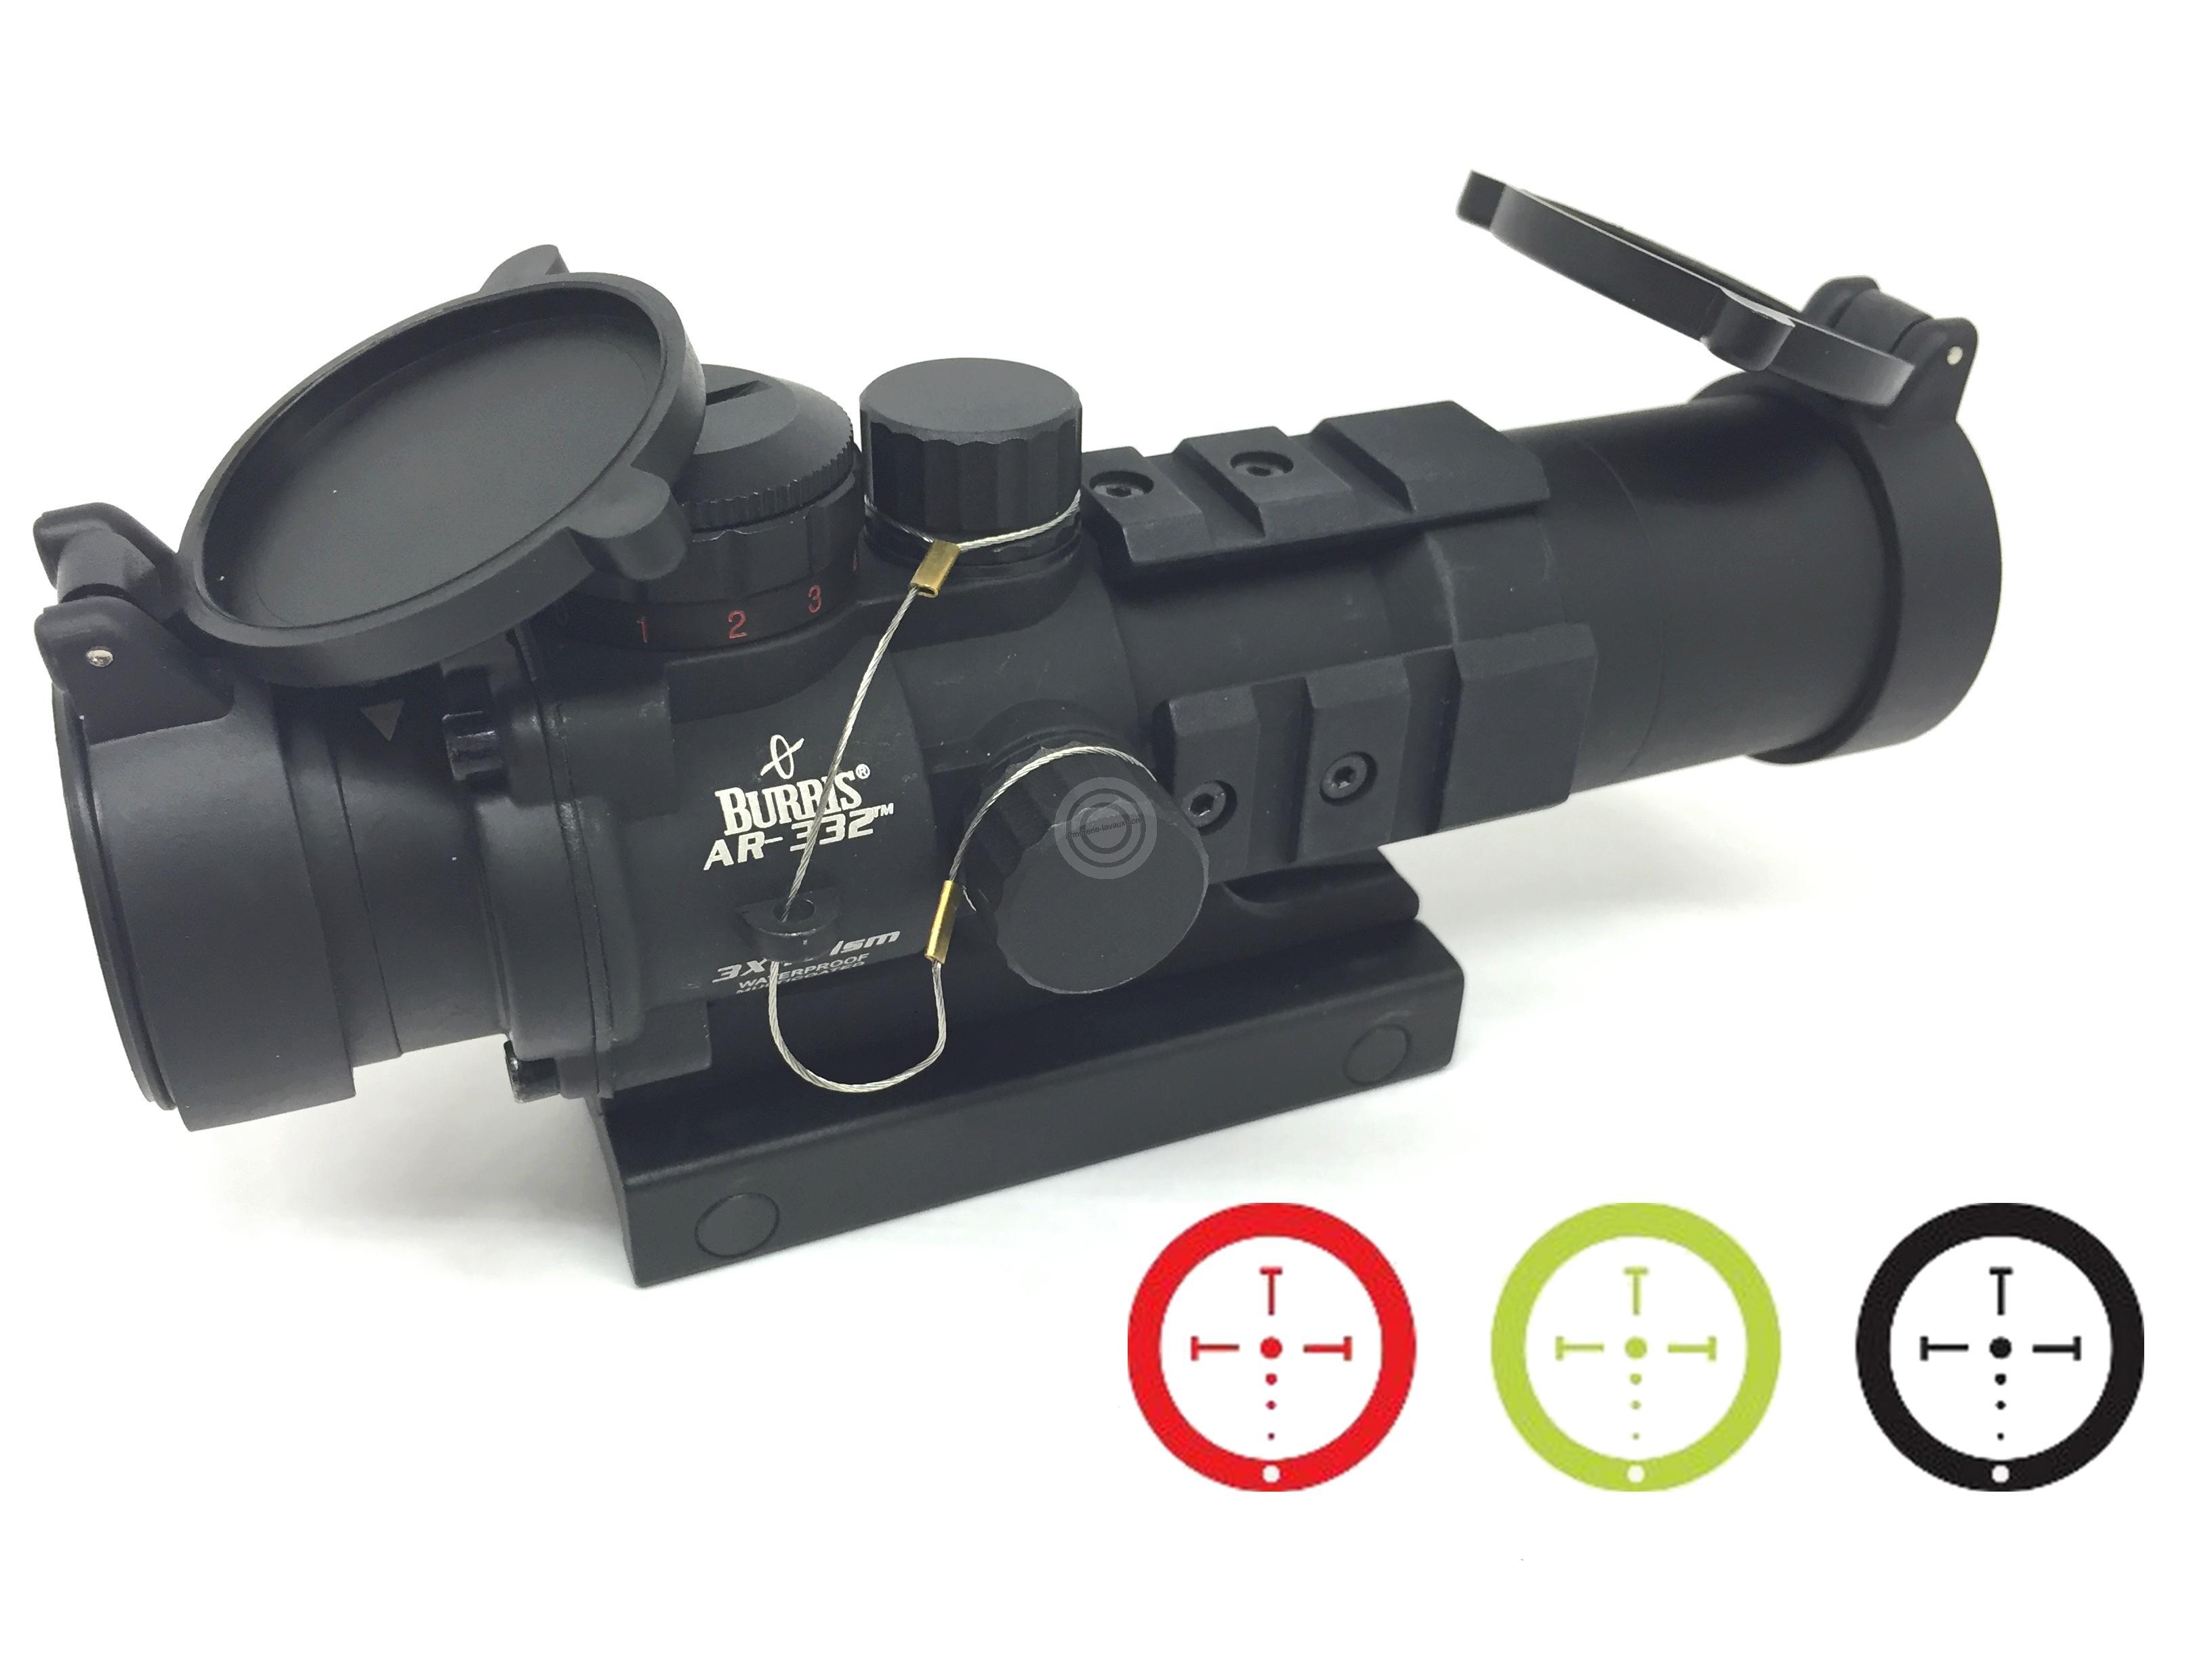 Point rouge tactical BURRIS AR-332